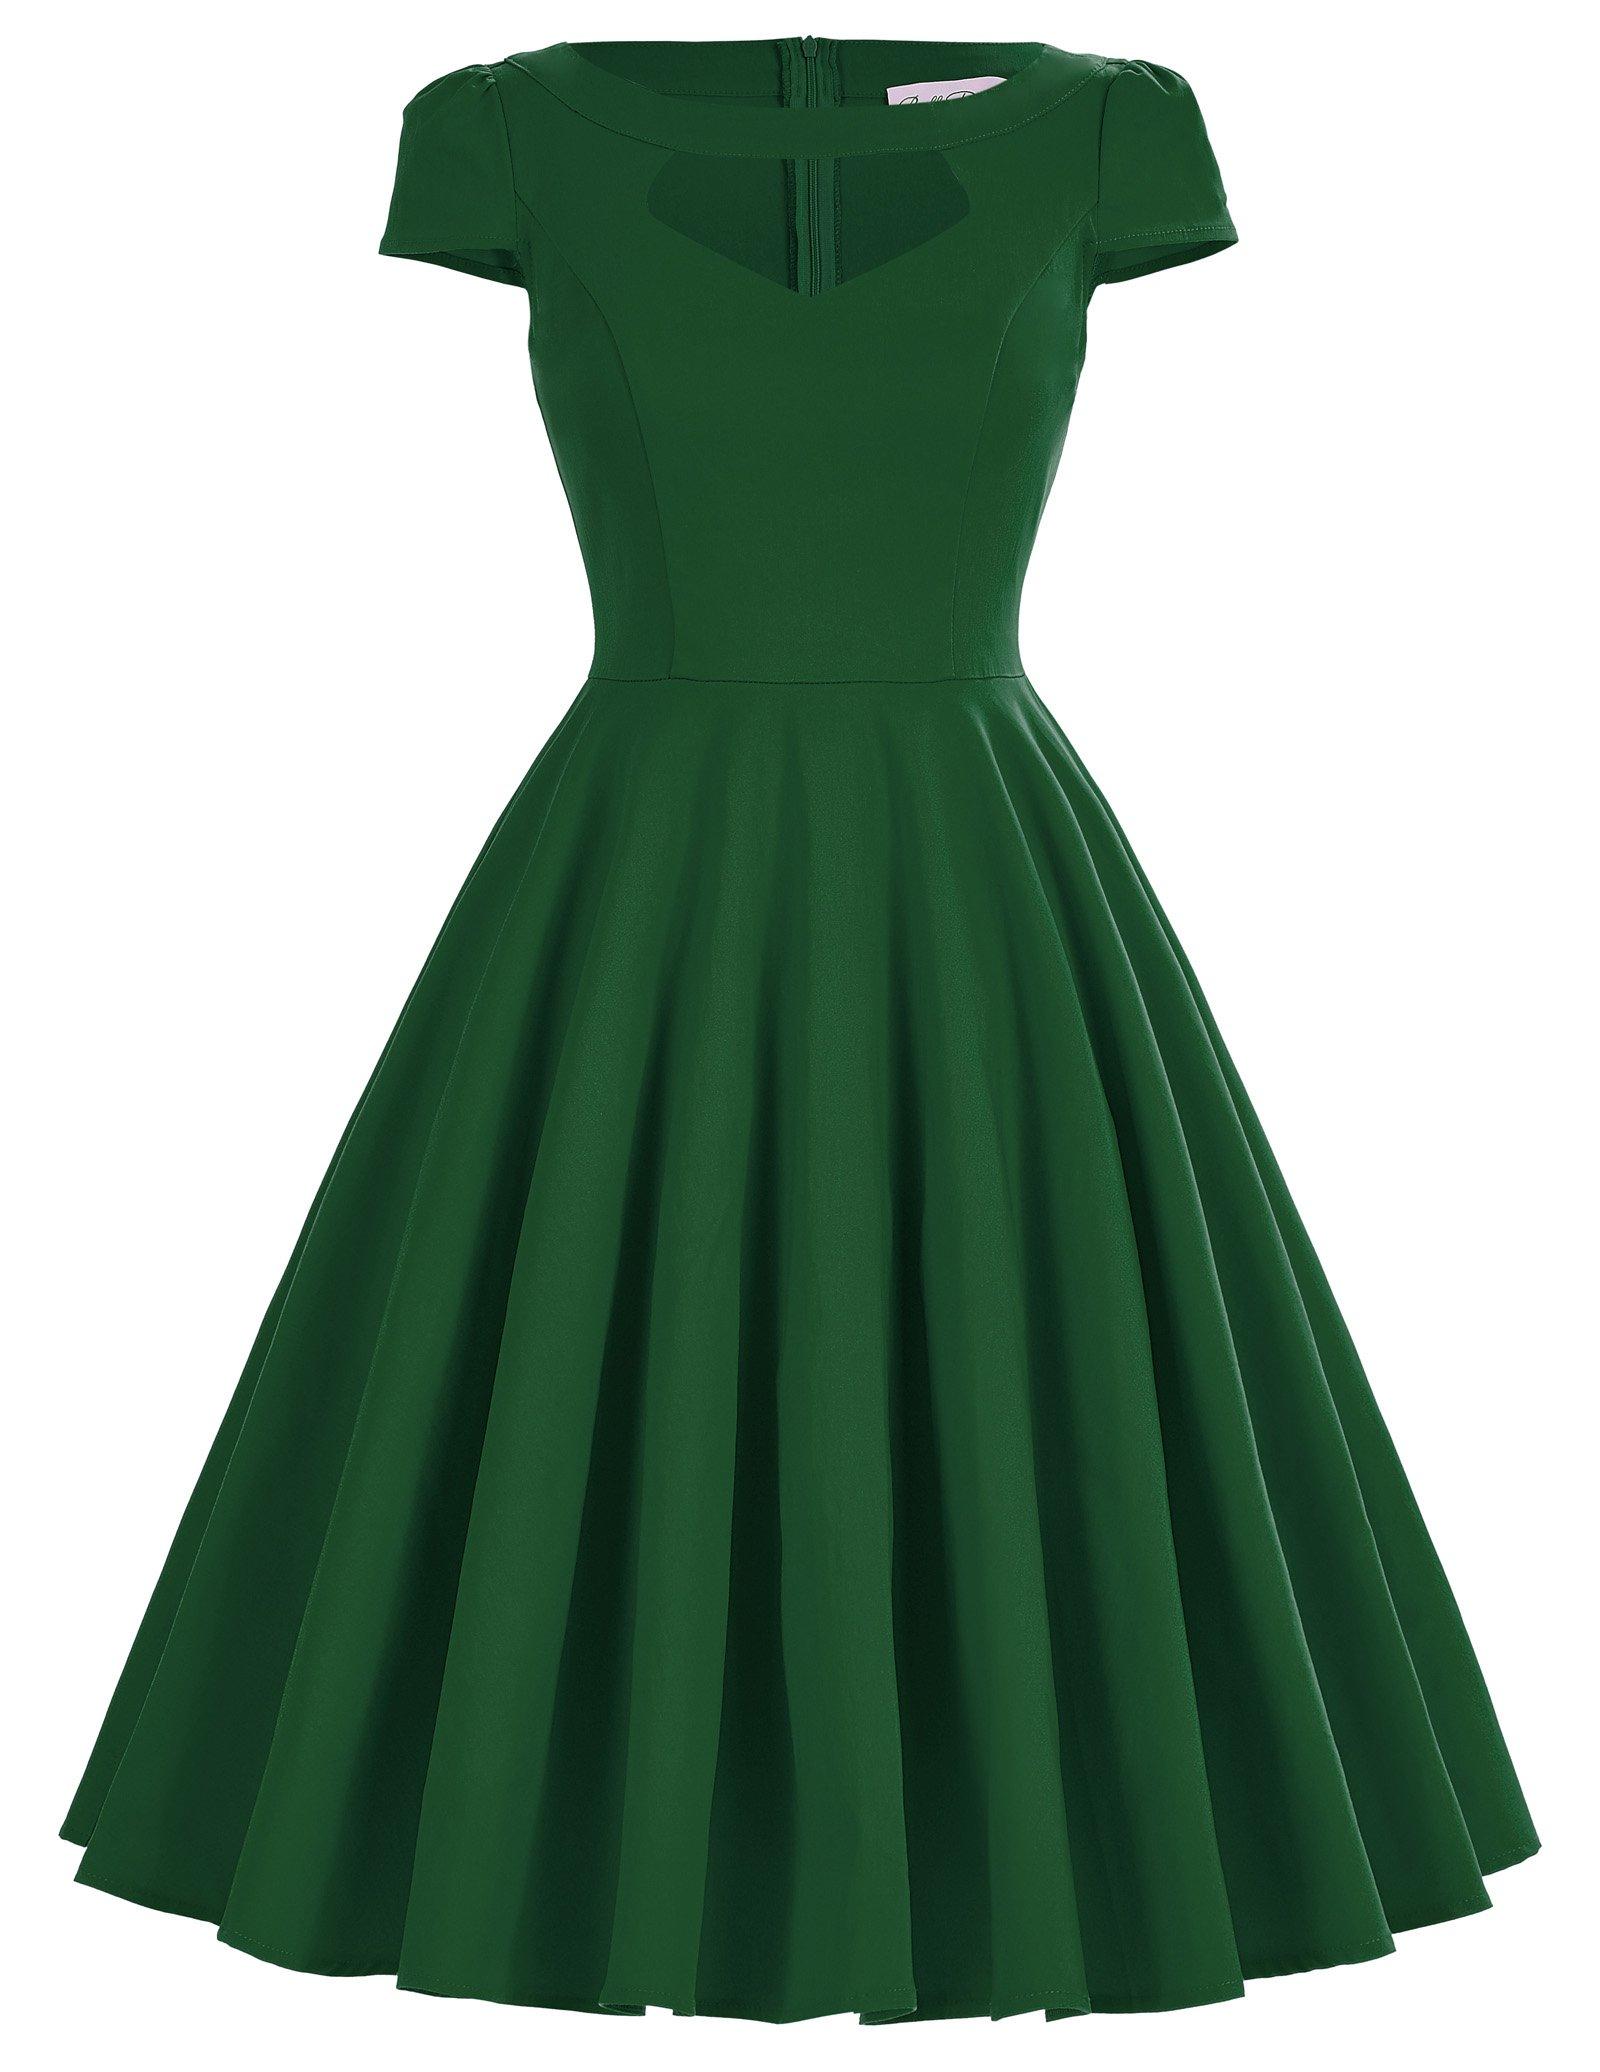 Belle Poque Women's Empaire Waist 40s Style Dresses Dark Green Size L BP0189-3